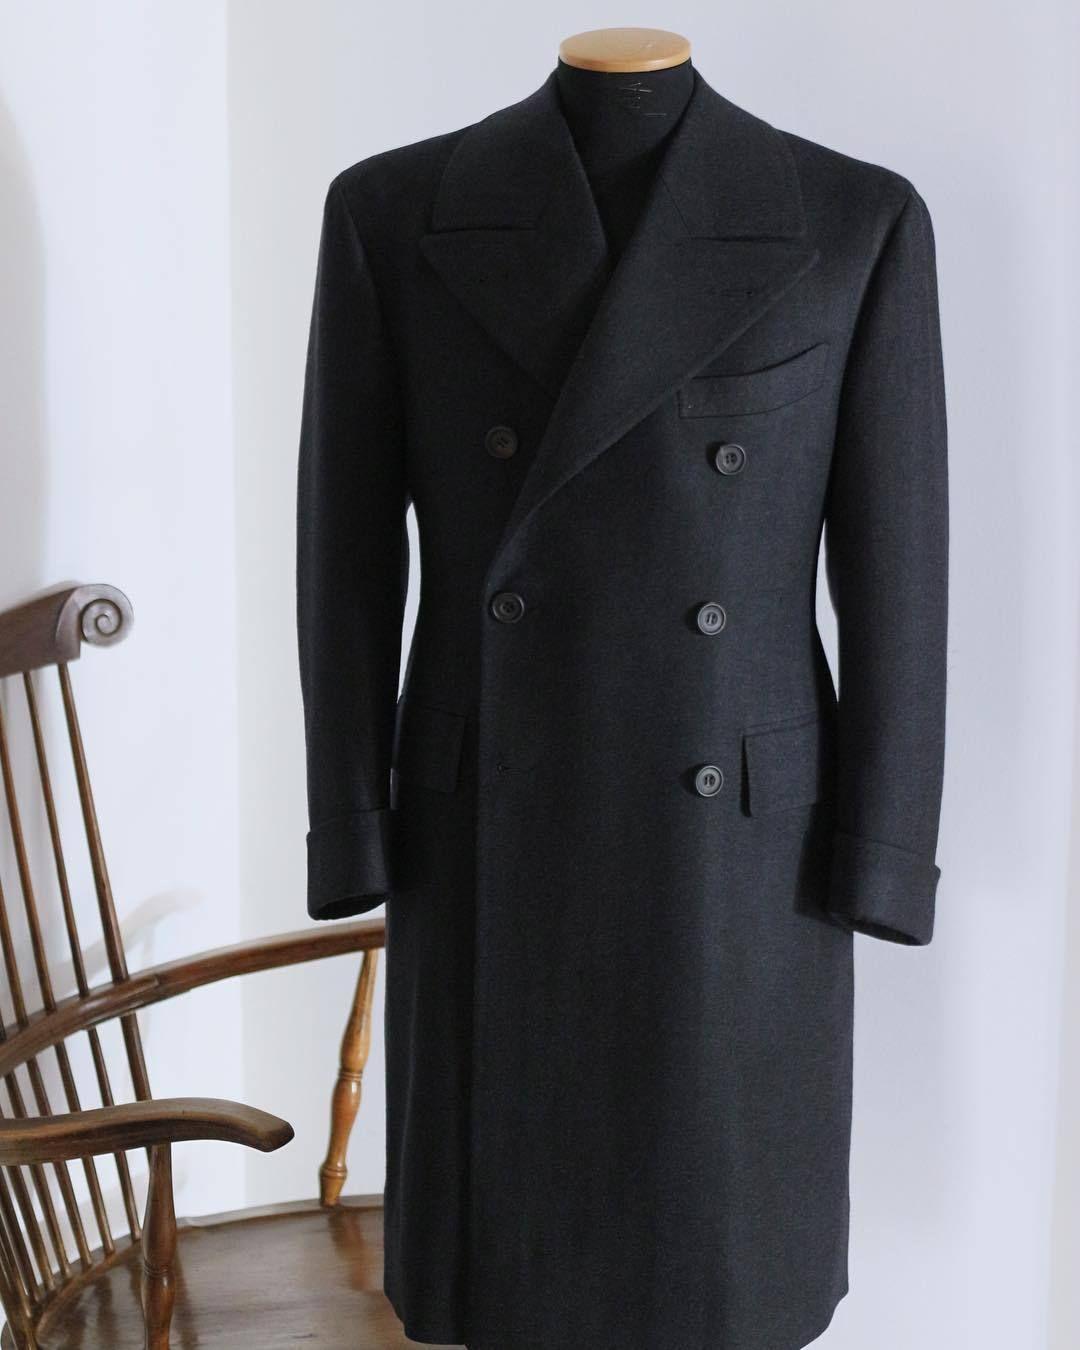 Charcoal Herringbone Windsor Collection Coat